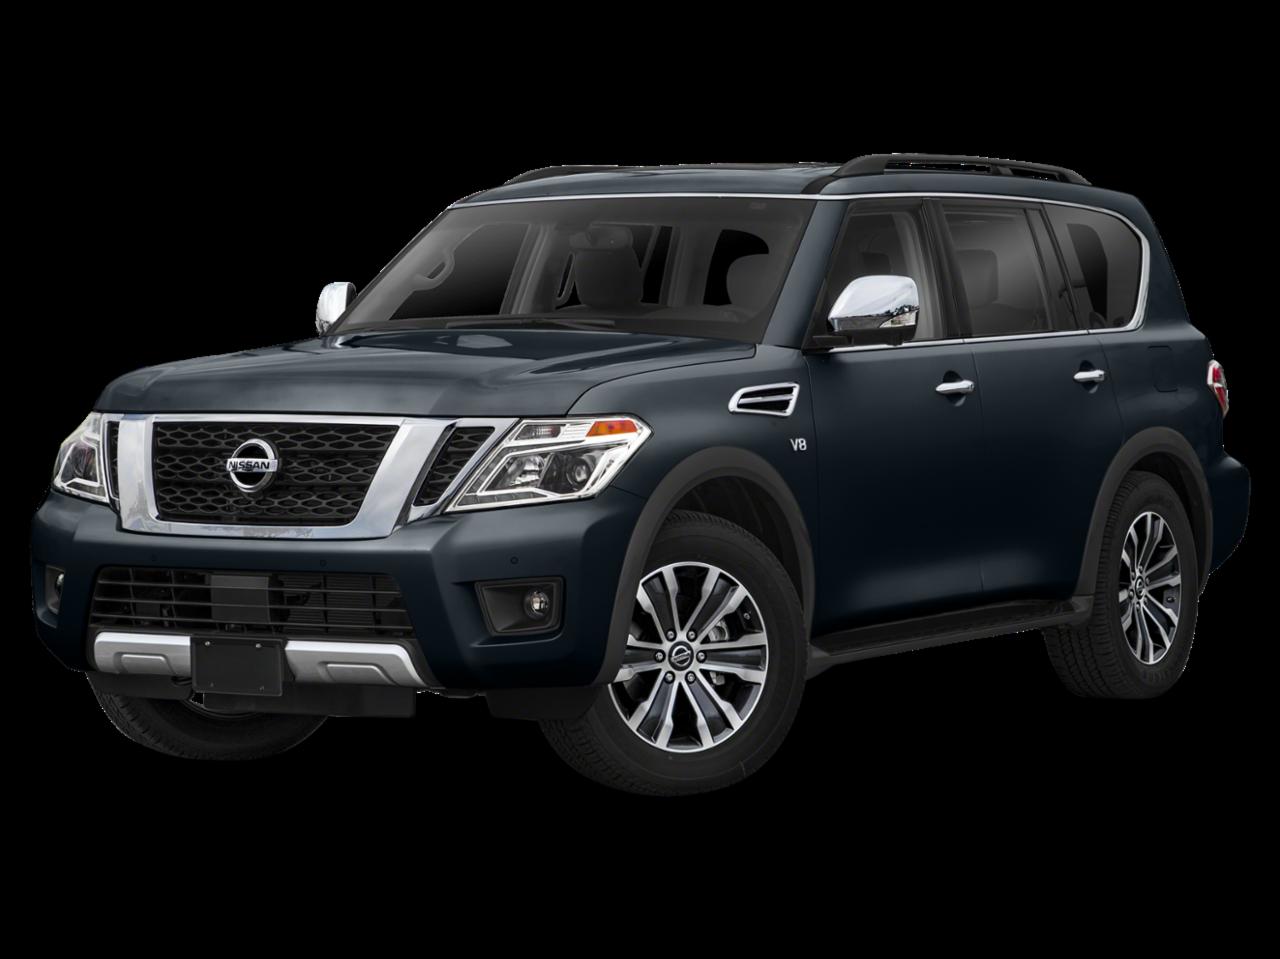 Nissan 2019 Armada SL